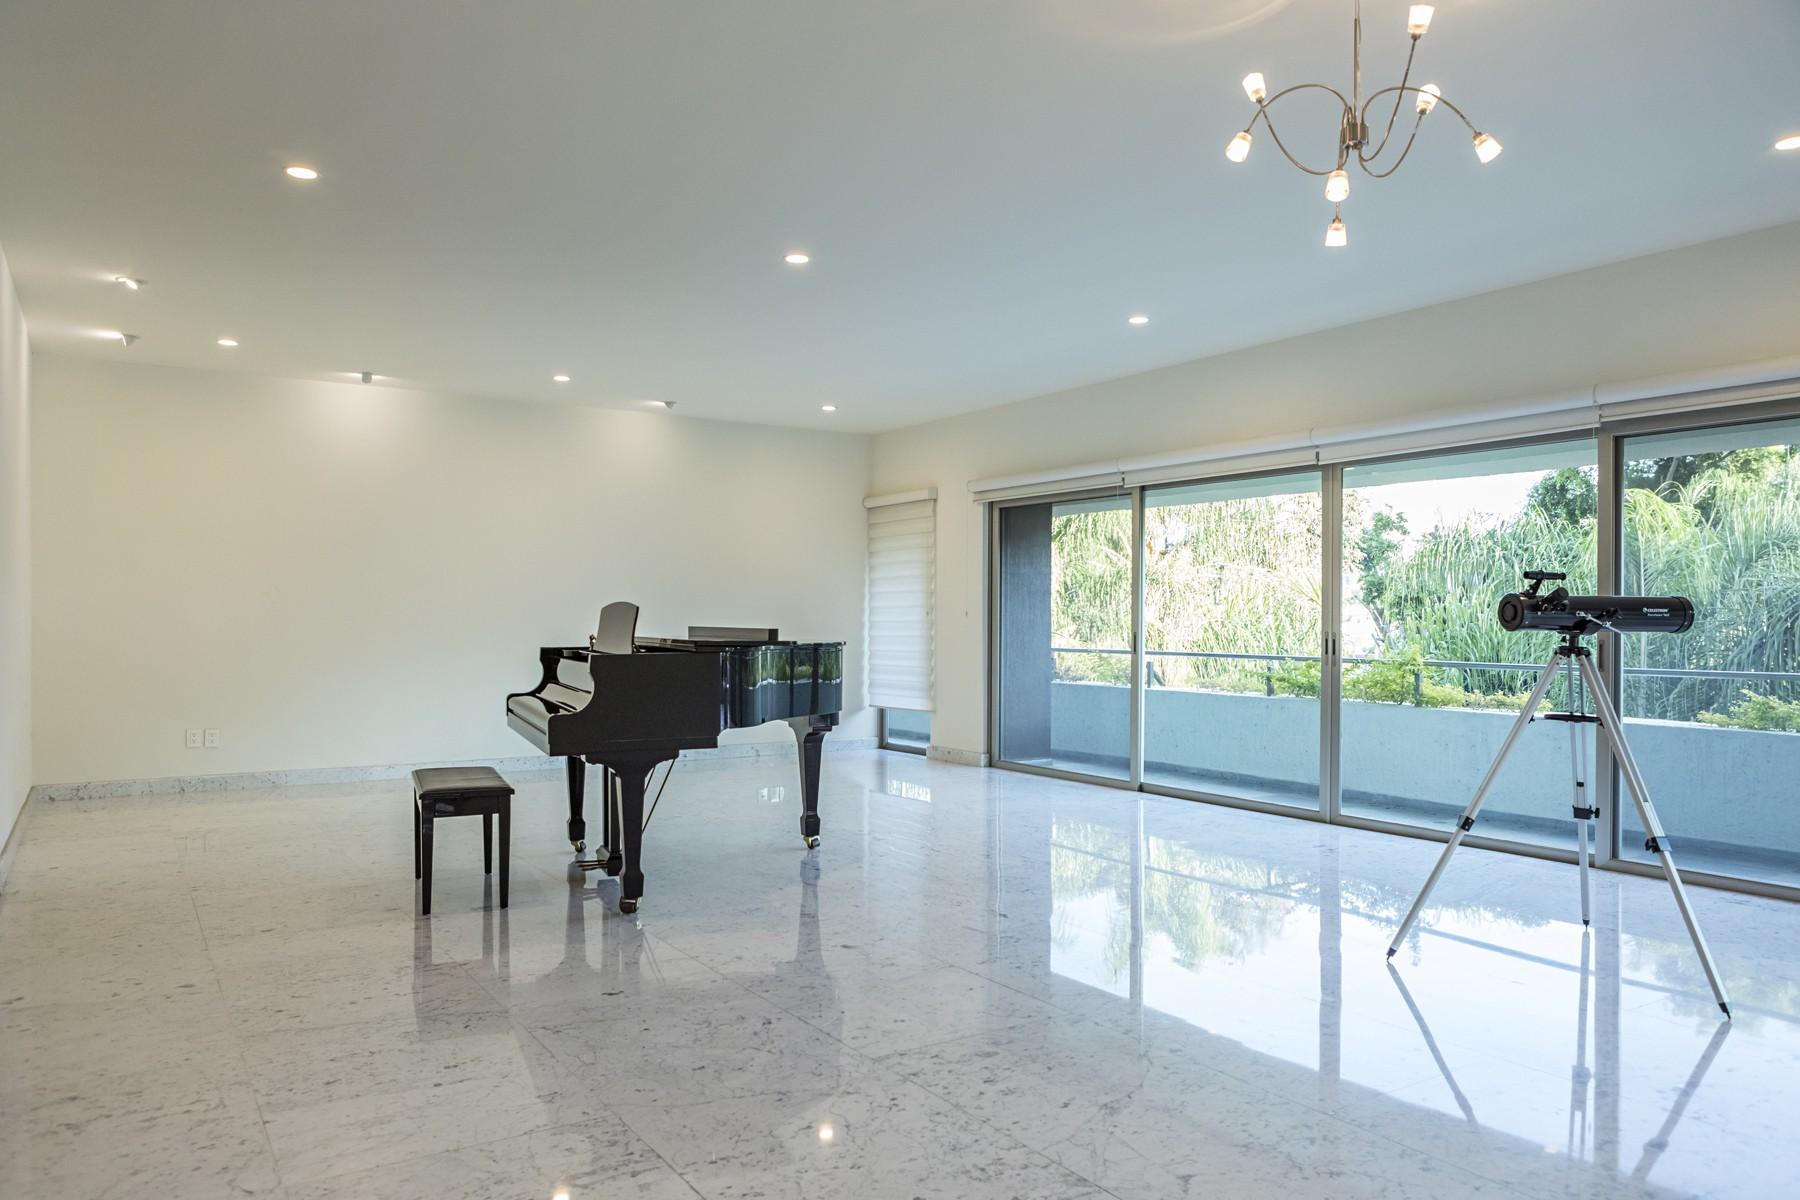 Additional photo for property listing at Piso 3, Río de la Plata Rio de la Plata 2509 Guadalajara, Jalisco 44660 México